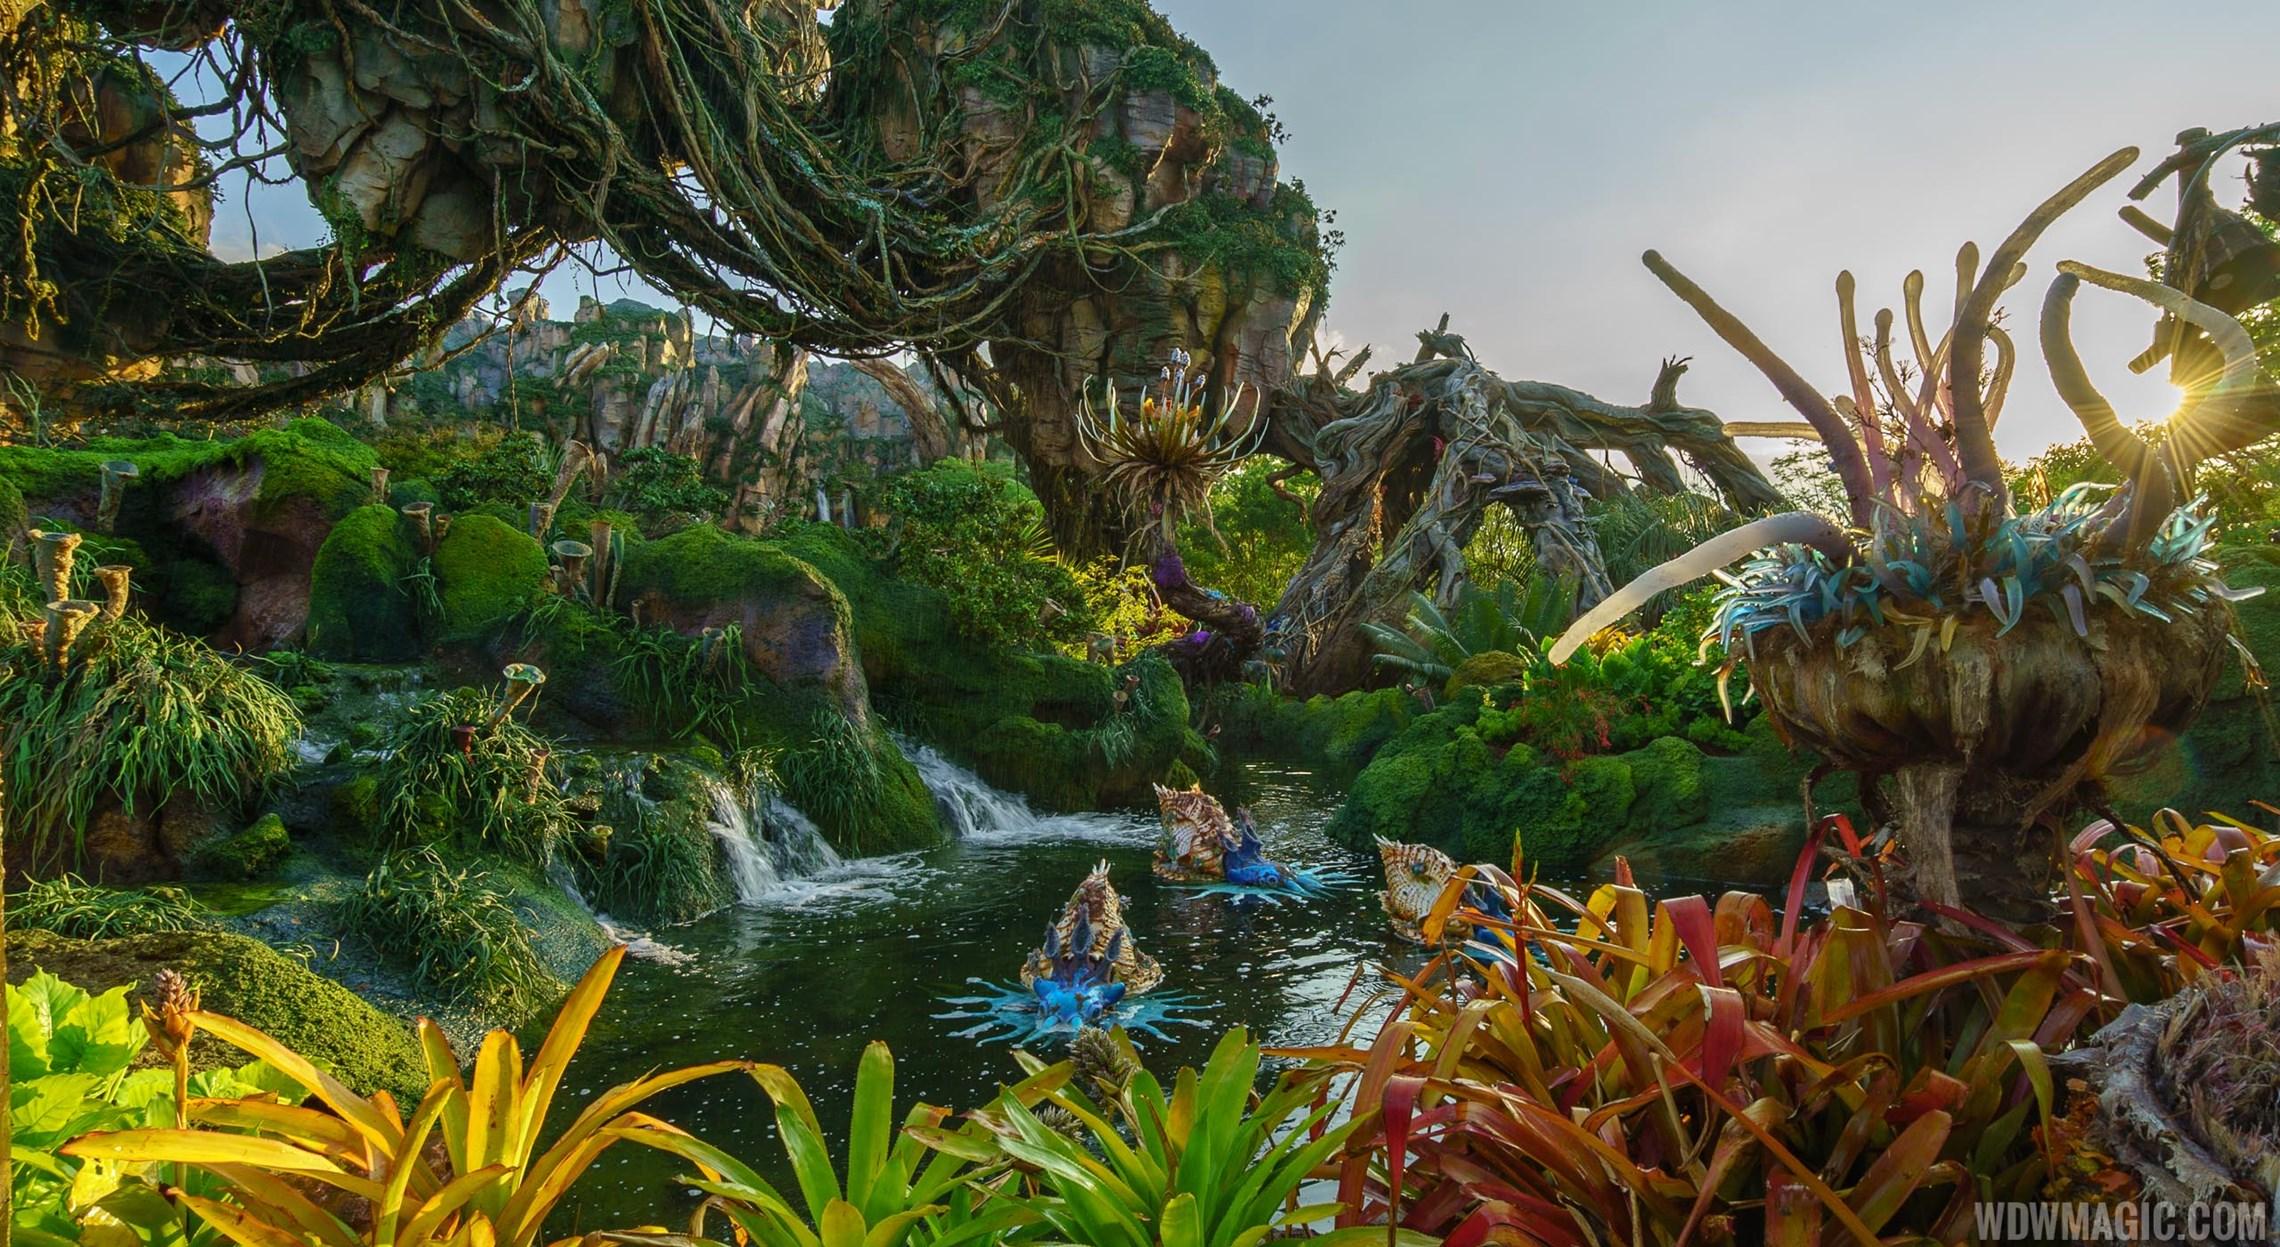 Tour the spectacular landscape of Pandora